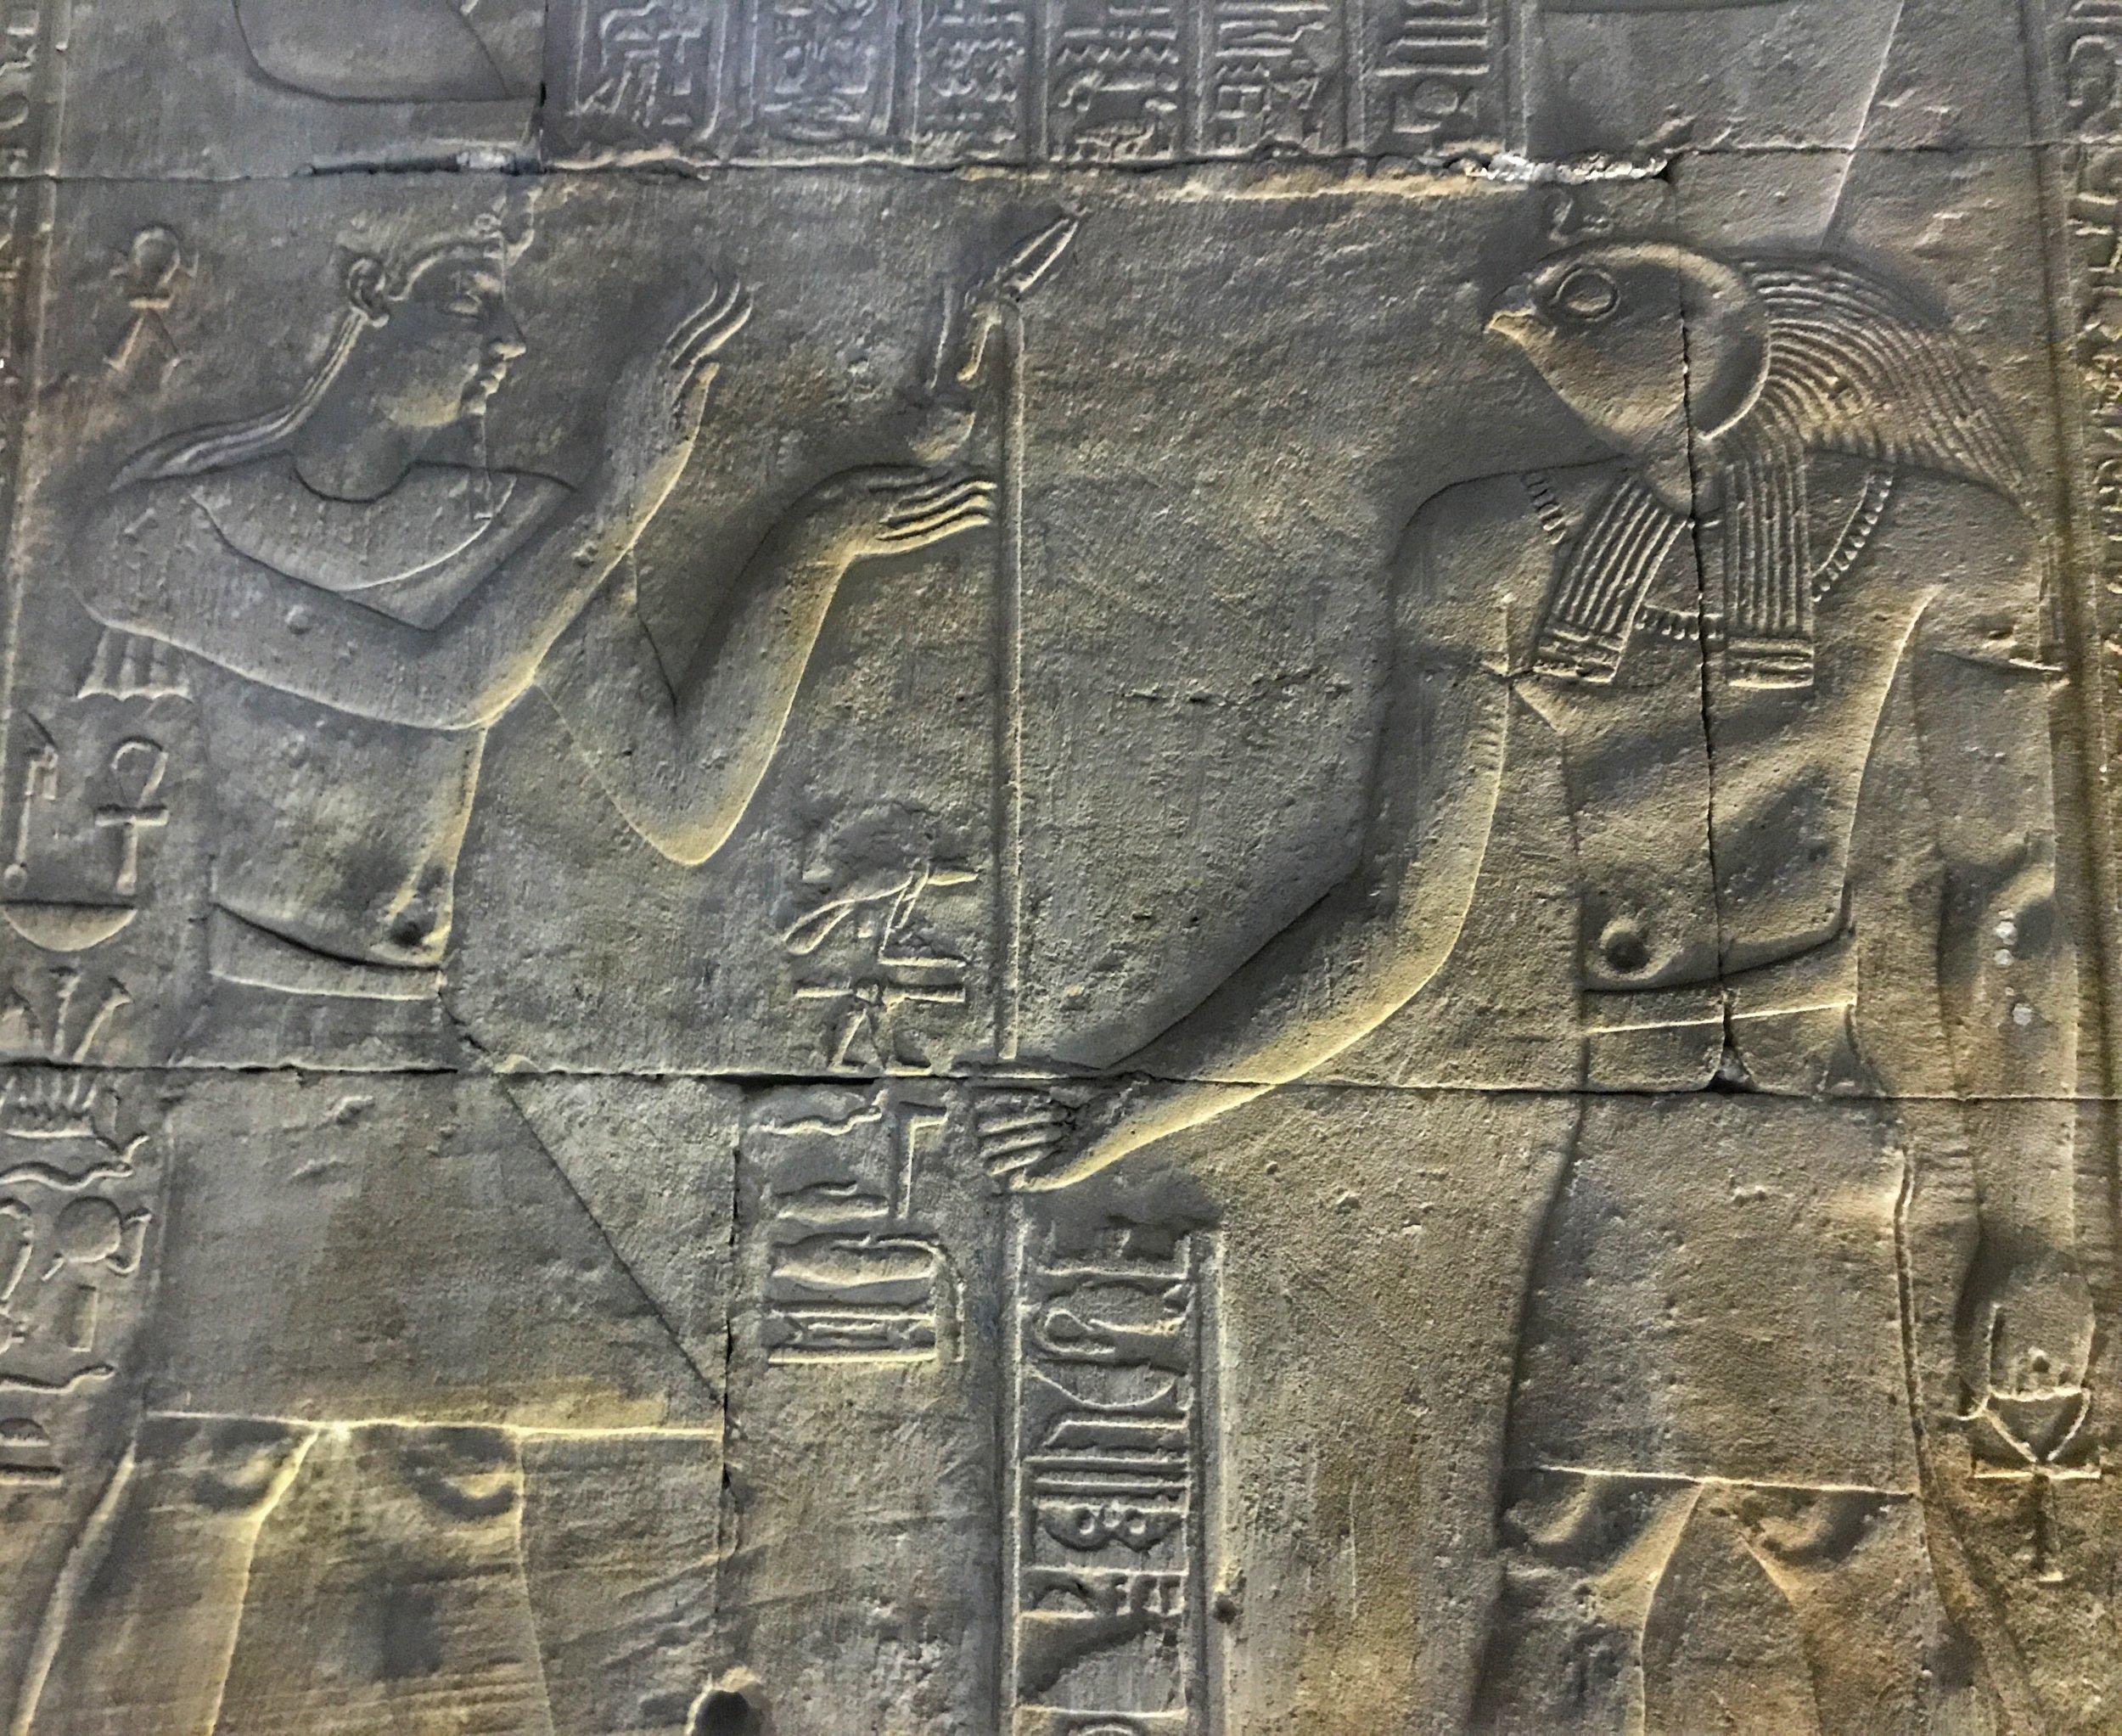 One of the Ptolemies honoring Horus